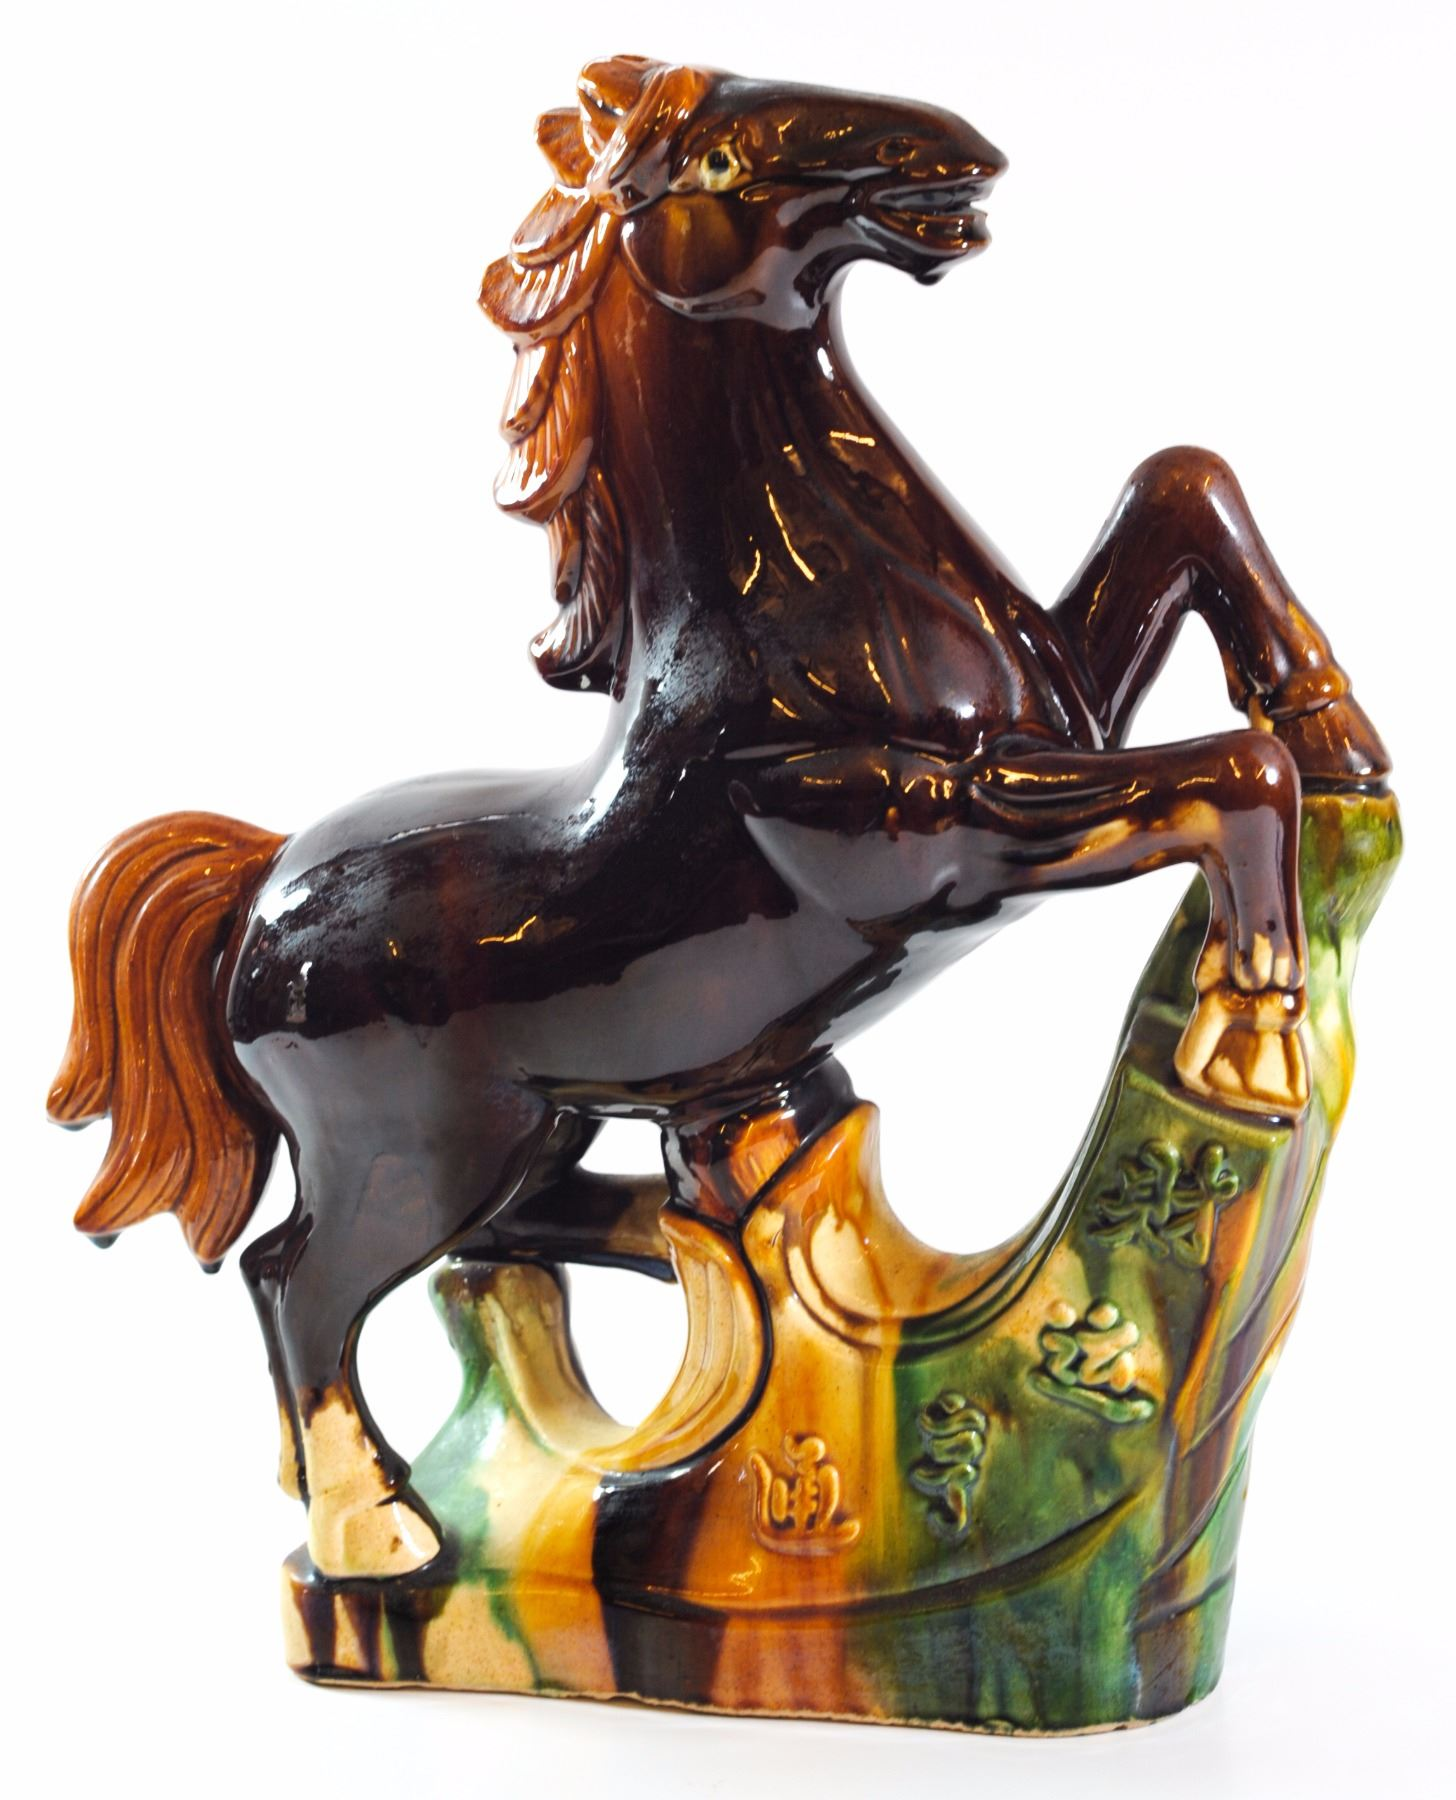 Old Chinese Ceramic Horse Sculpture